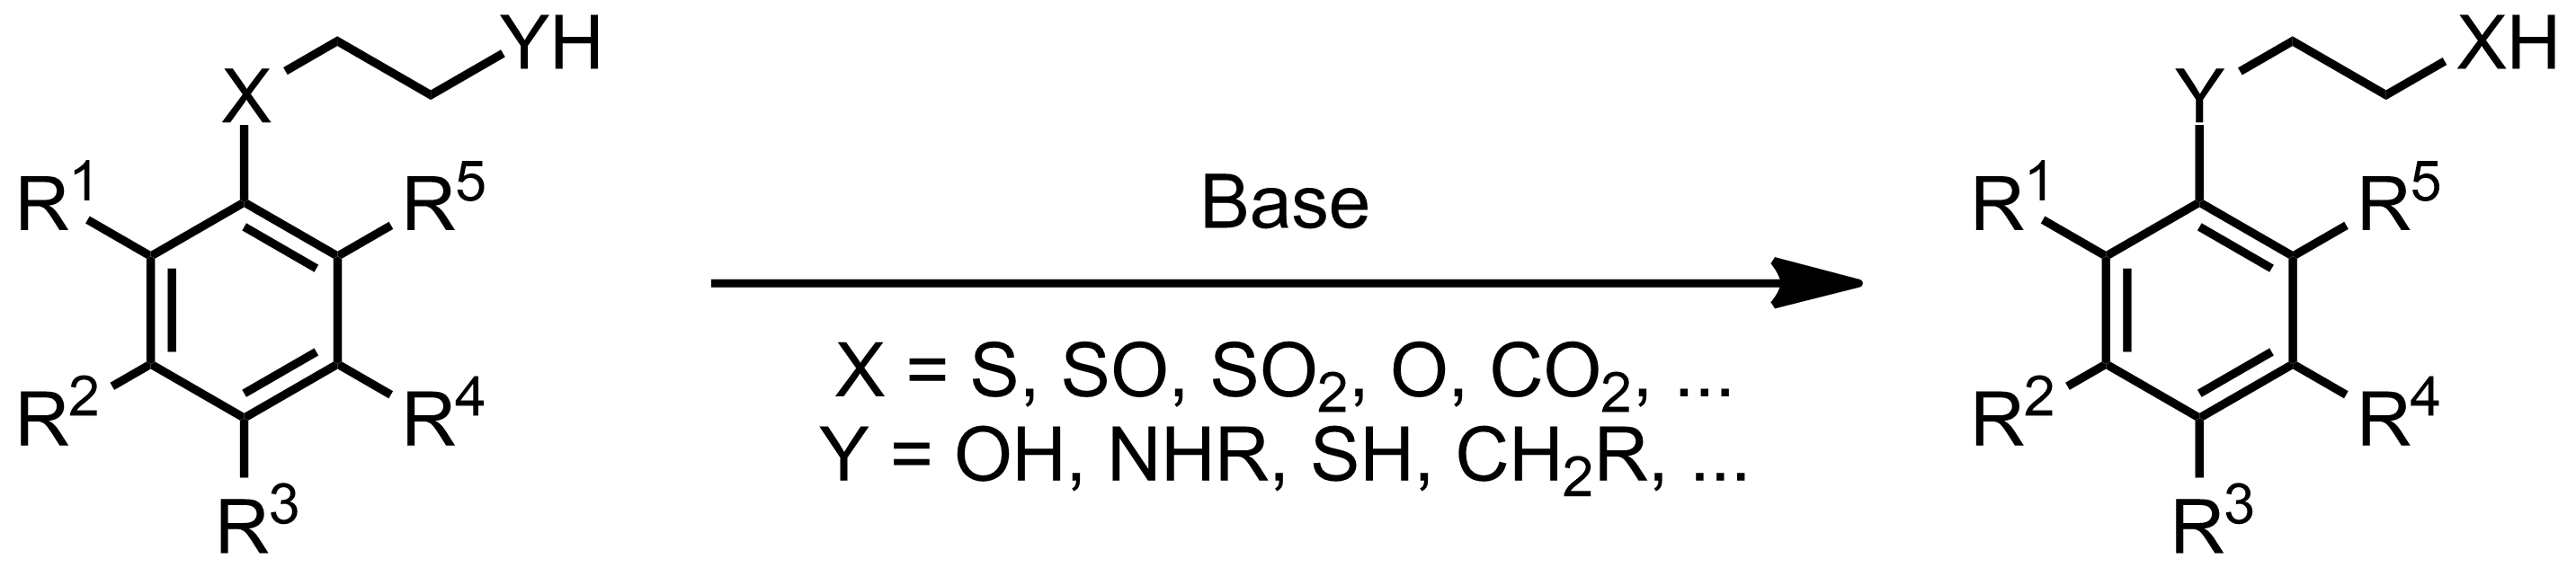 Schematic representation of the Smiles Rearrangement.